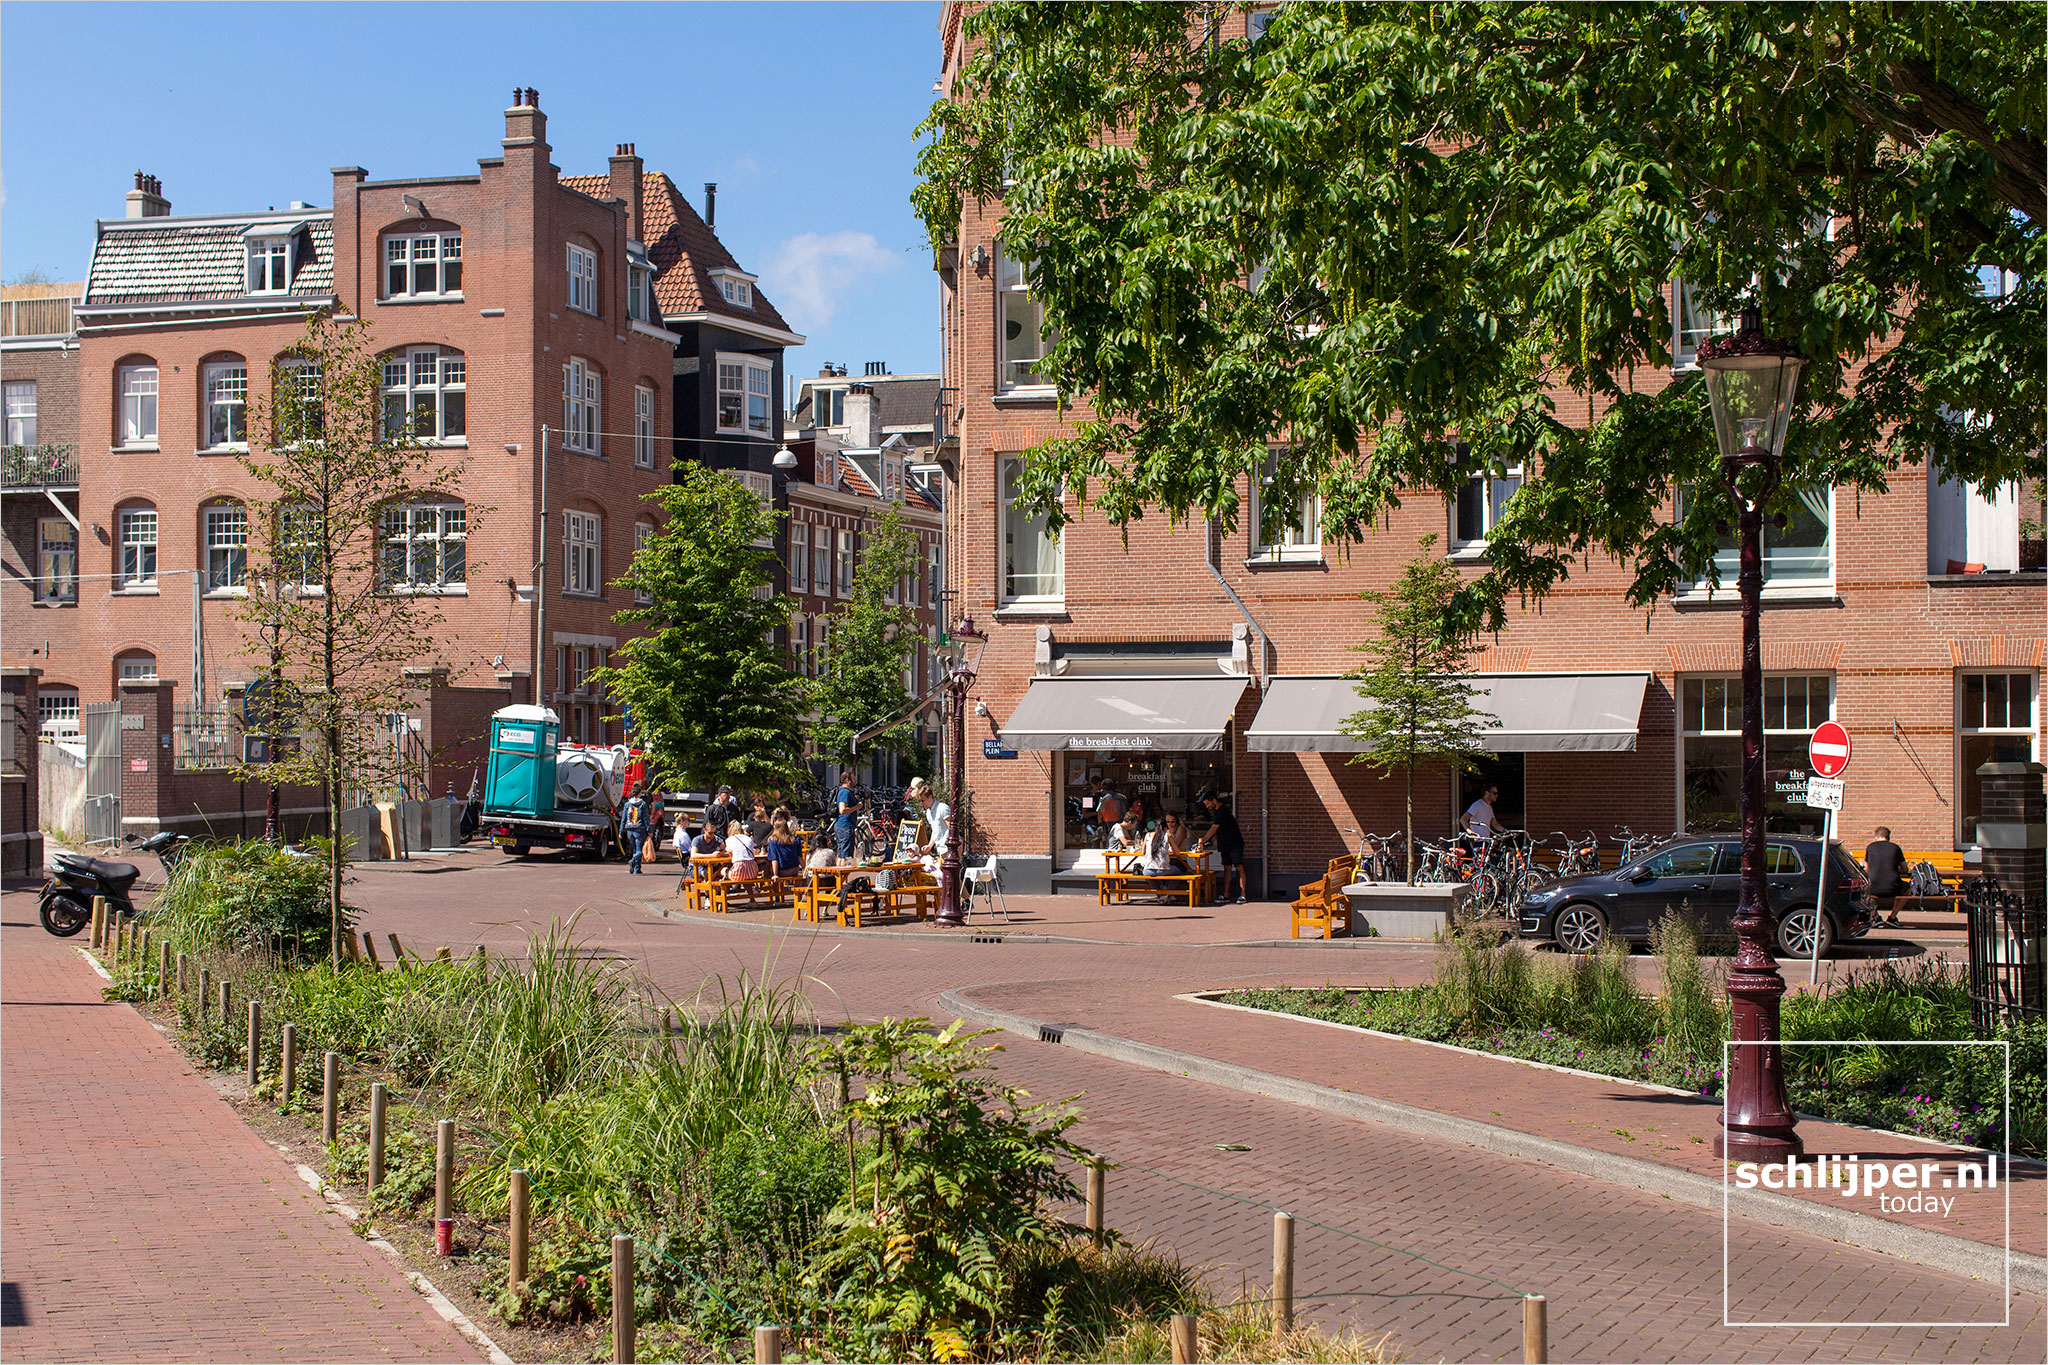 Nederland, Amsterdam, 13 juni 2020